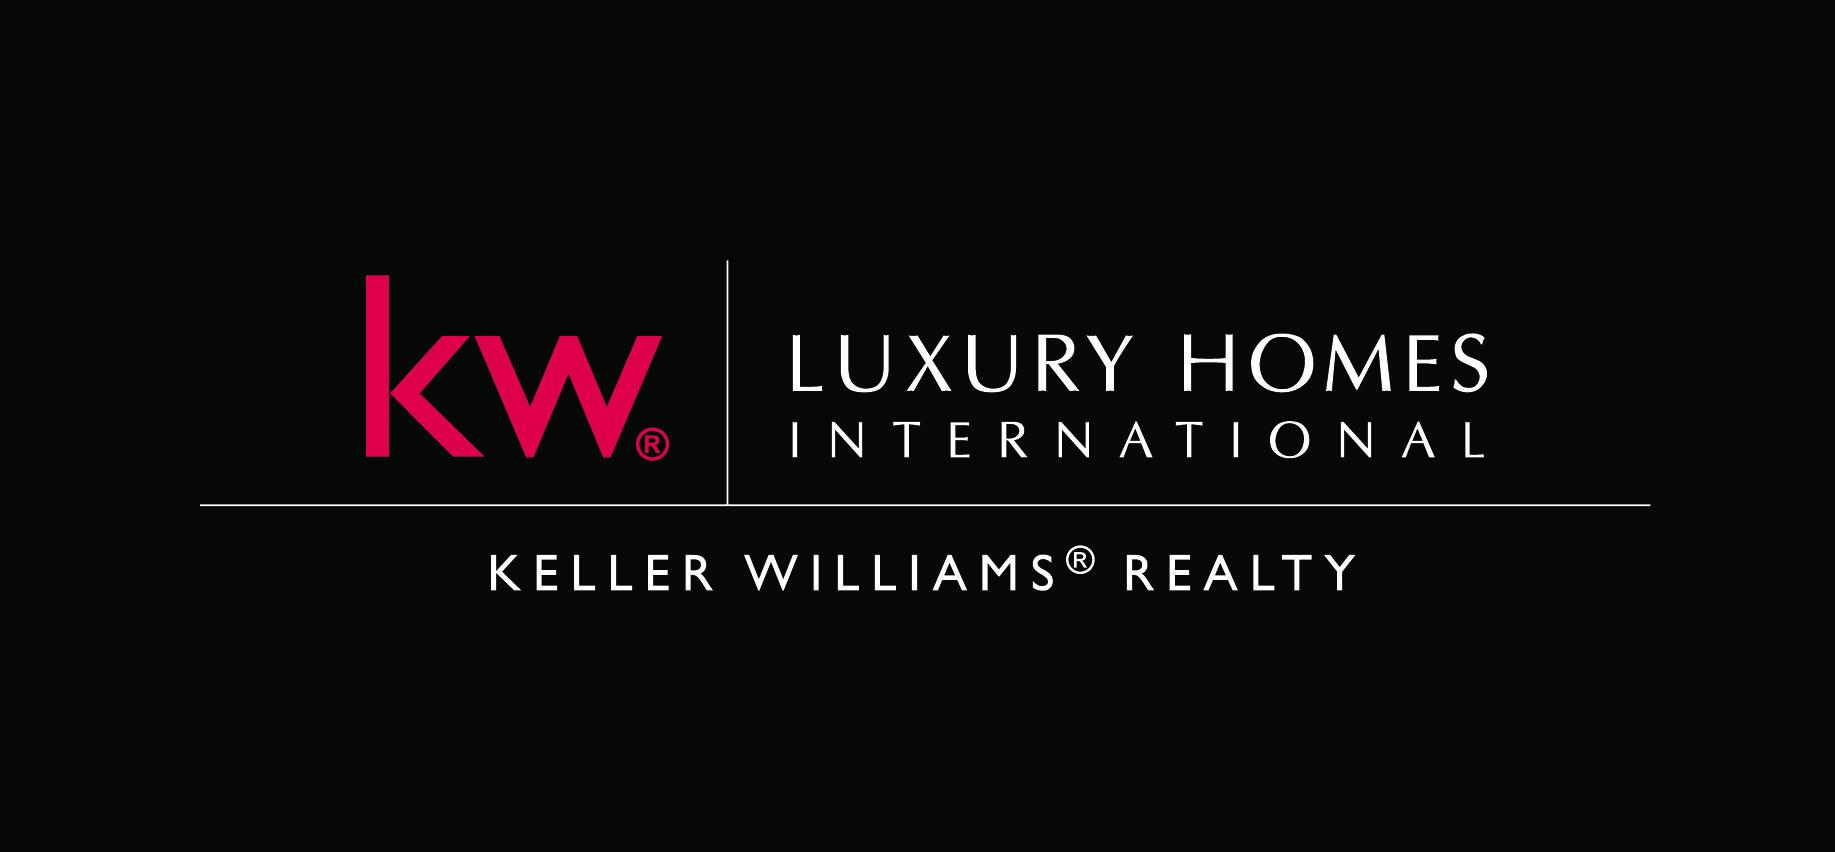 KW_Luxury_Homes_International_logo_white_cmyk